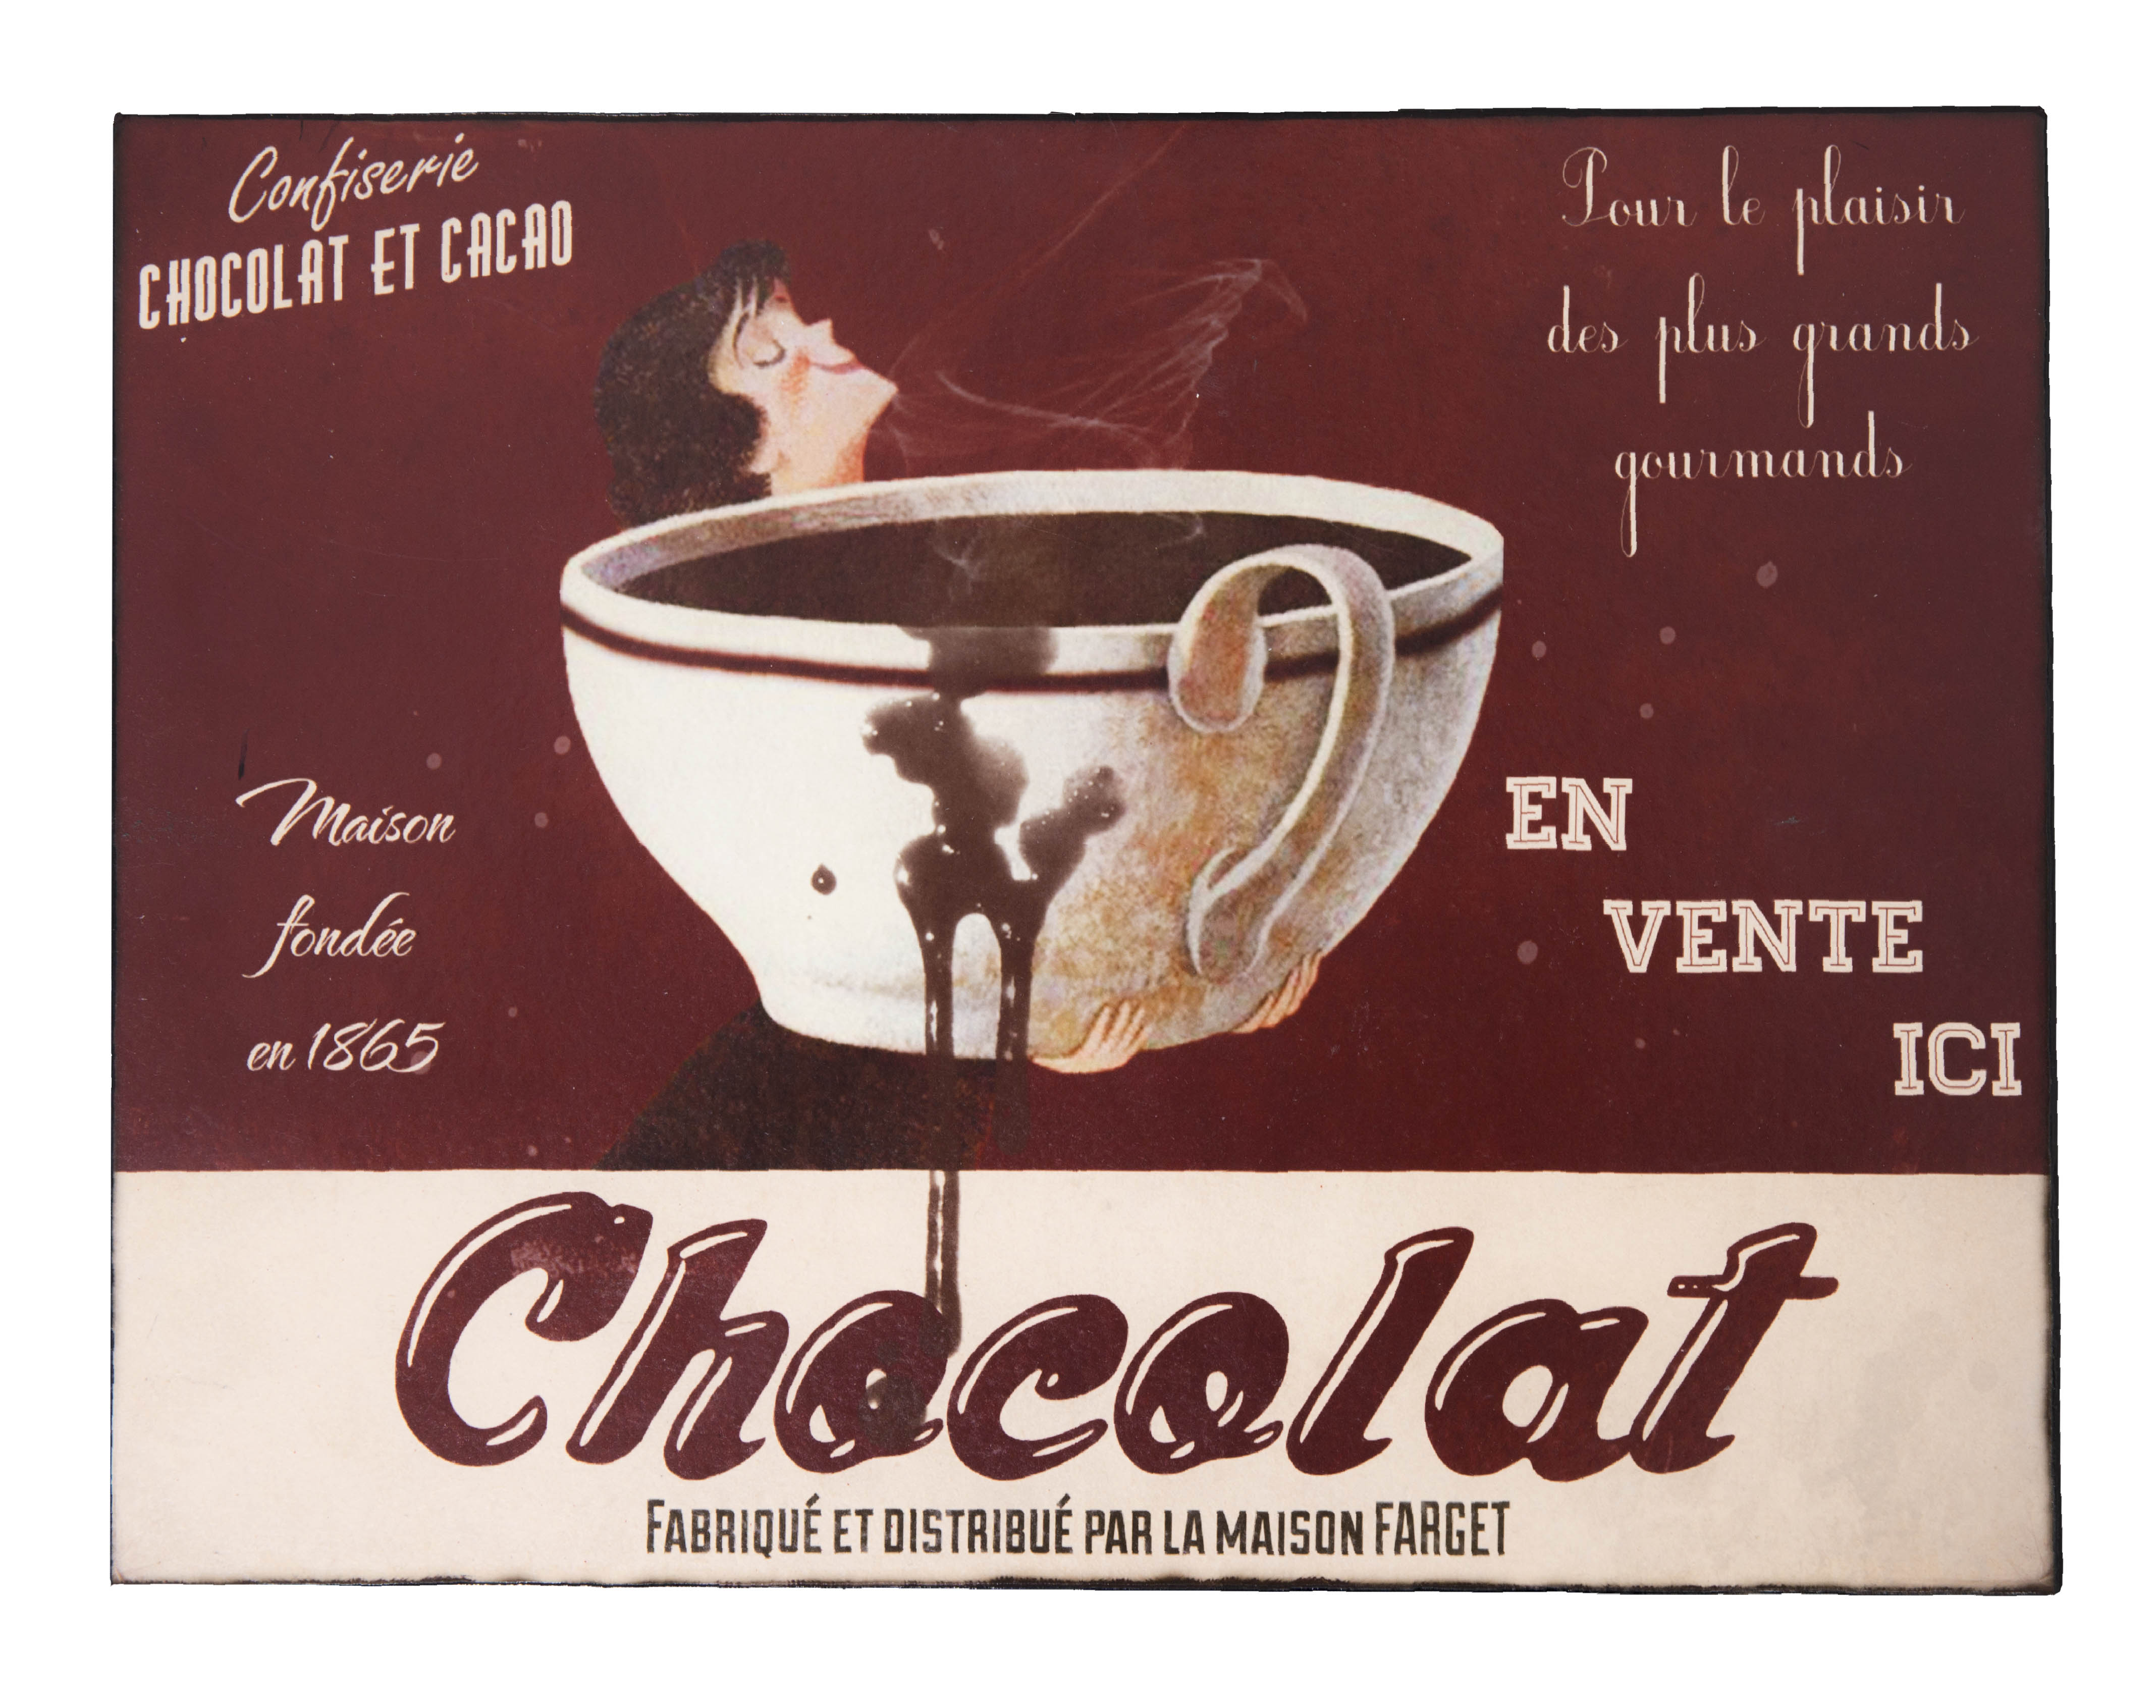 Декоративная табличка ChocolatДругое<br>Материал: Железо, бумага<br><br>Material: Железо<br>Length см: None<br>Width см: 36.3<br>Depth см: 1.32<br>Height см: 27.5